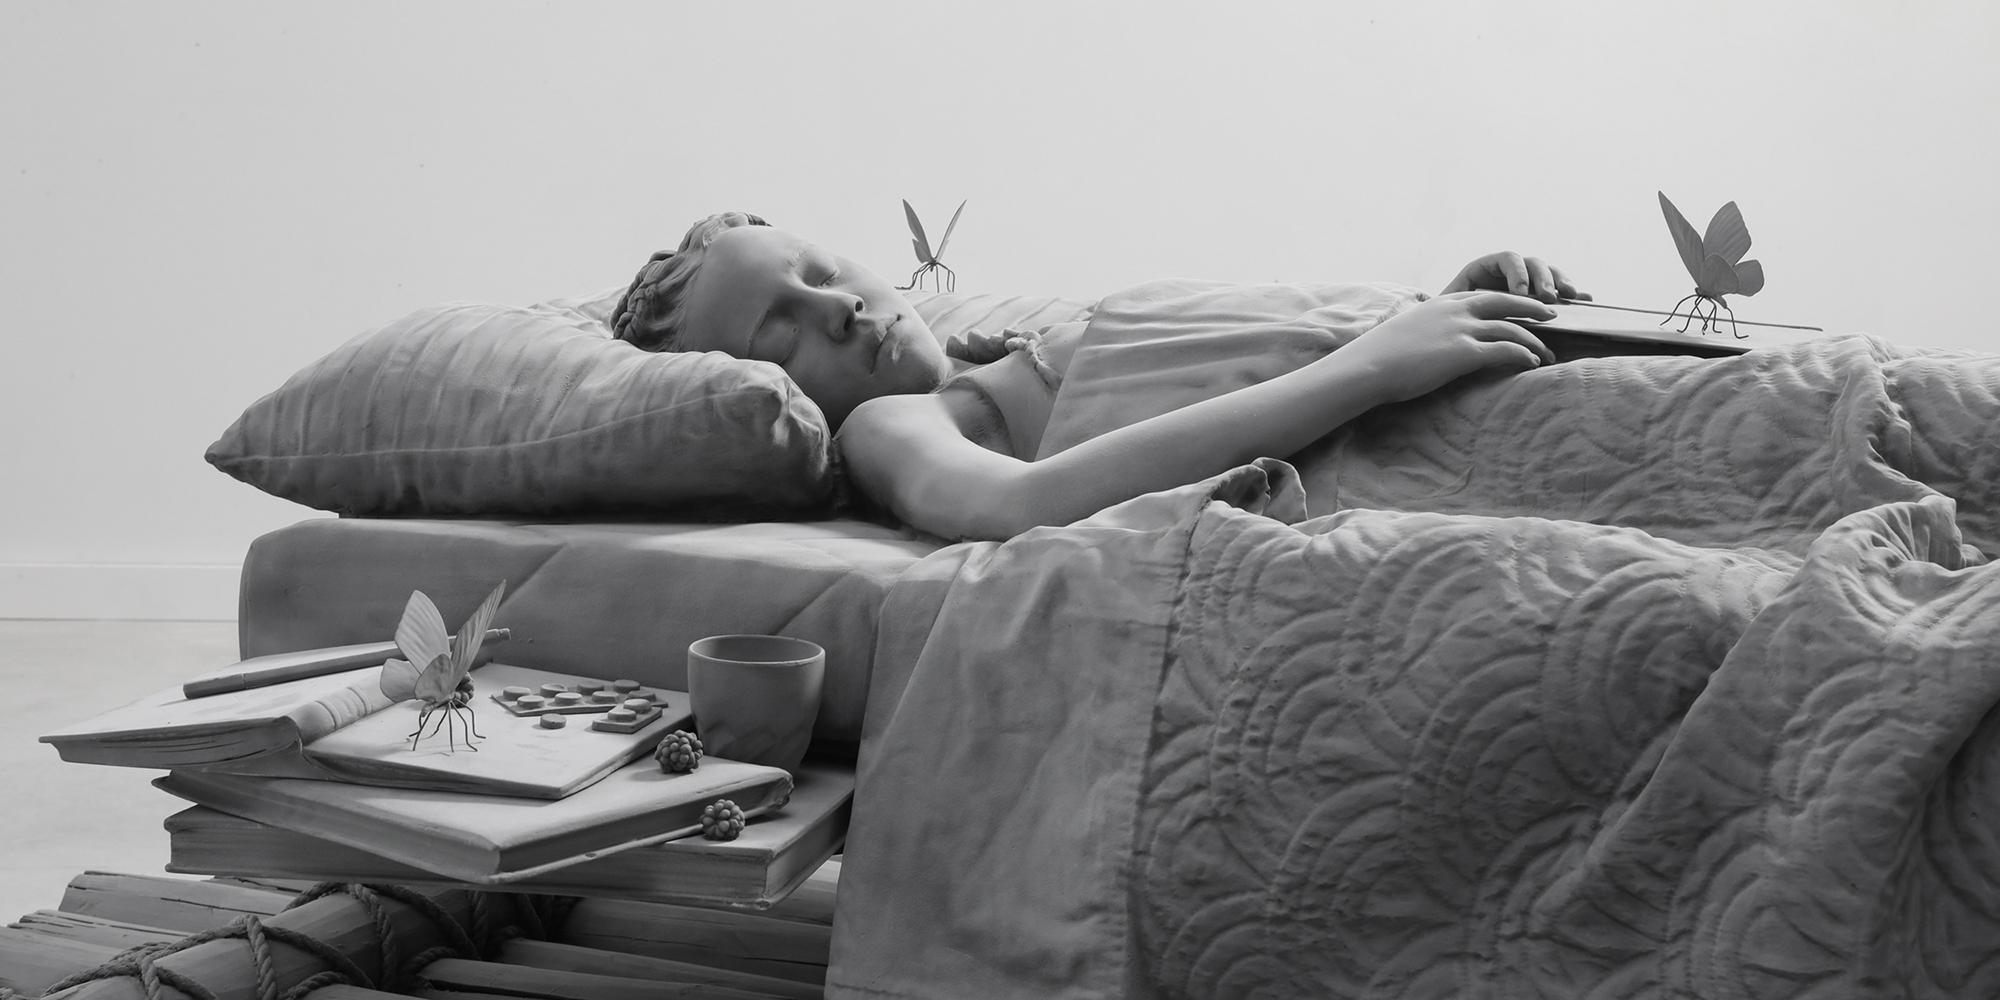 © Hans Op de Beeck, Sleeping Girl, 2018 (Detail) Skulptur aus Polyester, Aluminum und Beschichtung, 210 x 100 x 76 cm  © Studio Hans Op de Beeck / Bildrecht, Wien, 2018